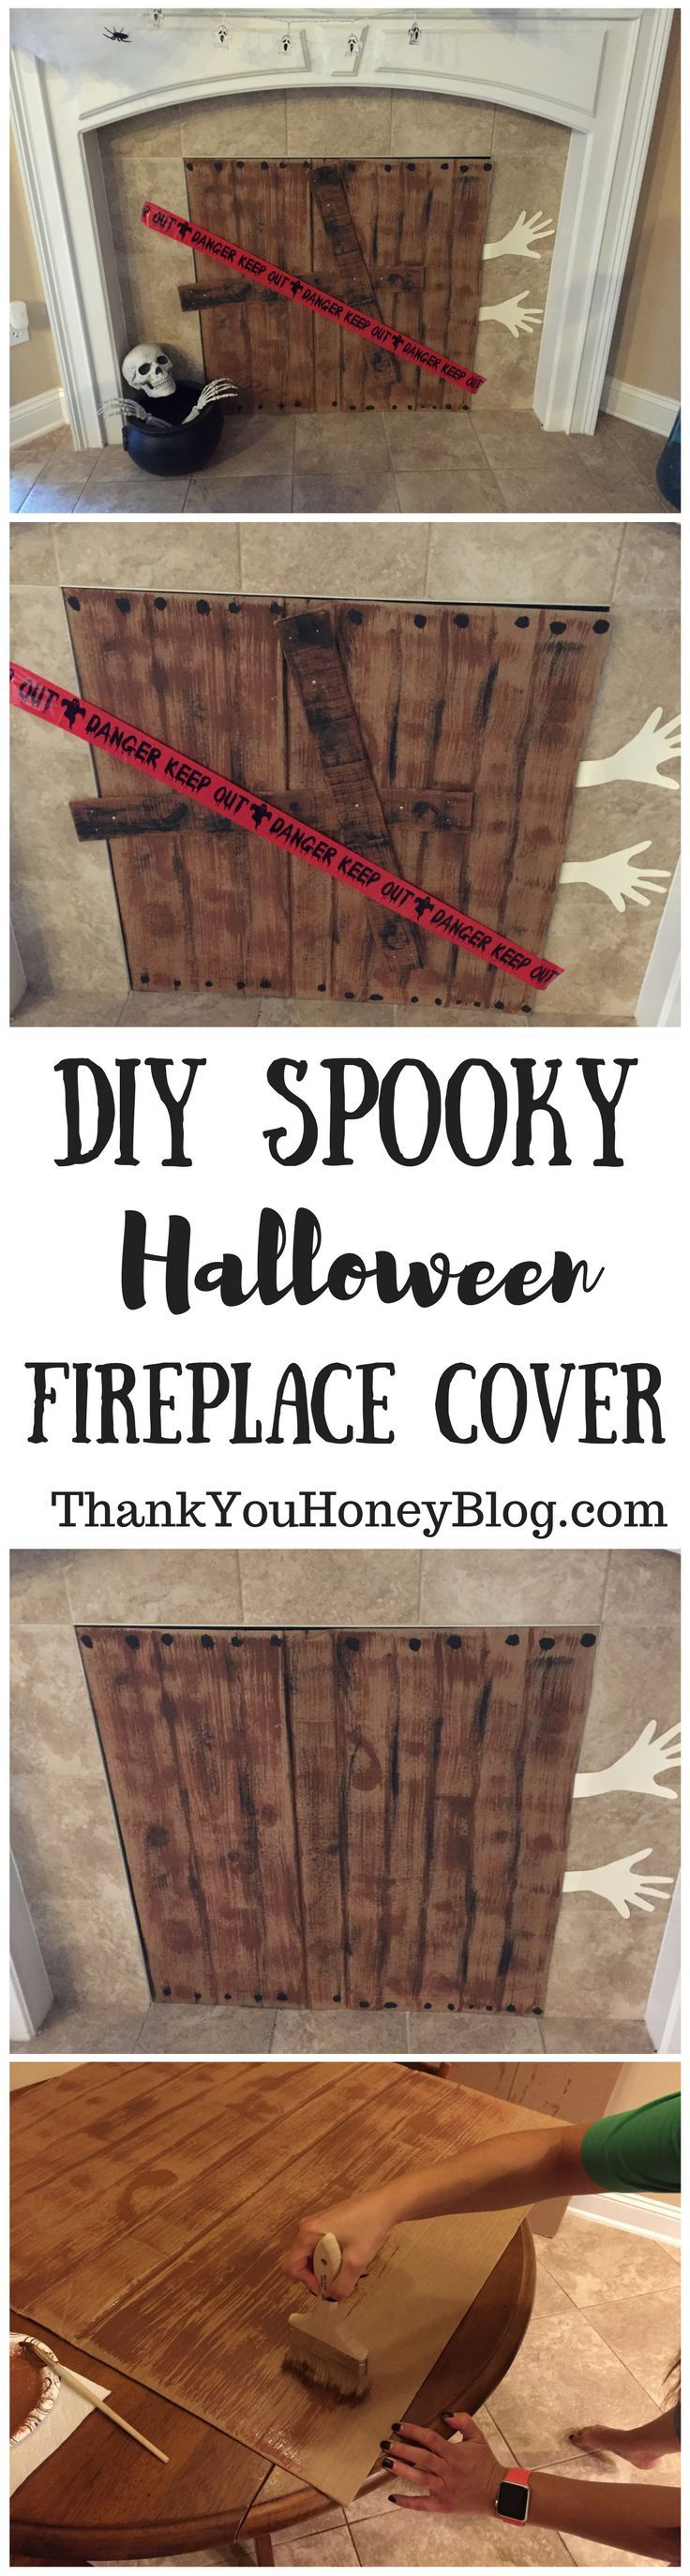 click through pin it to read later follow subscribe diy spooky halloween